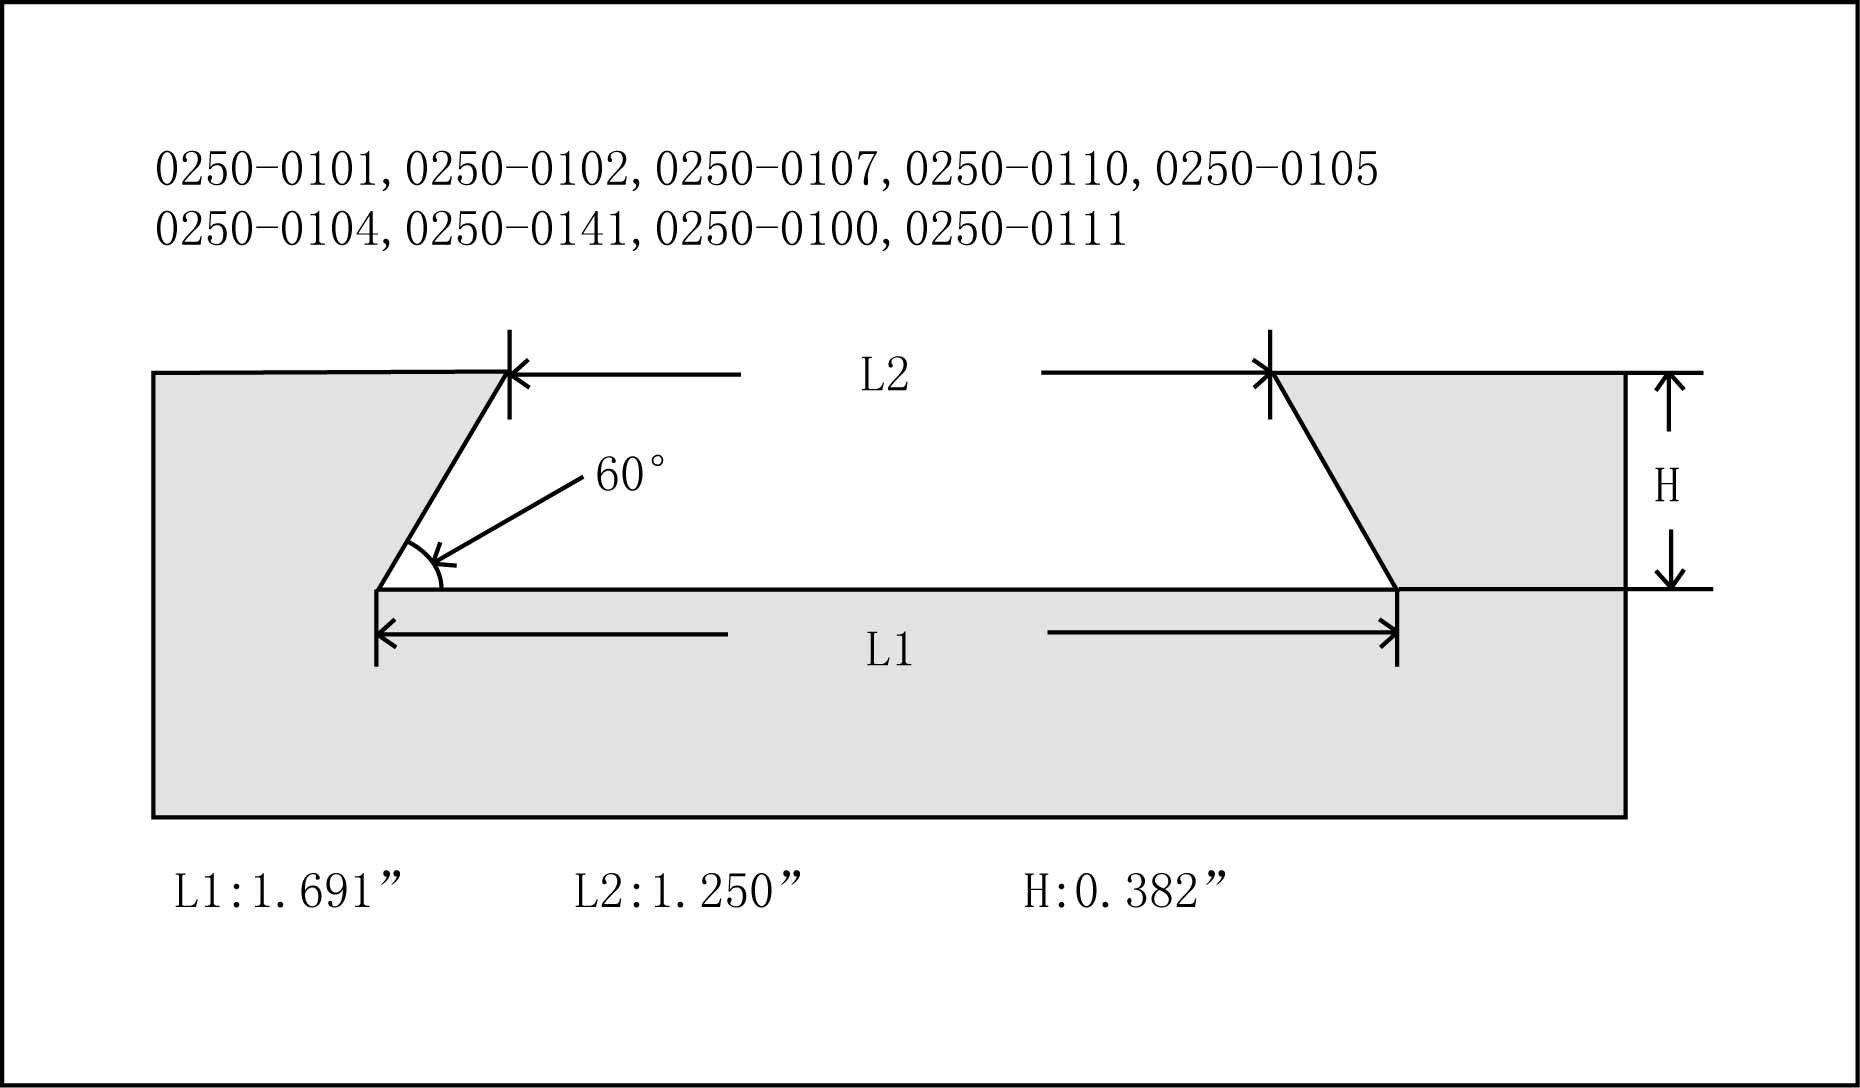 AccusizeTools - AXA 3/4'' Heavy Duty Boring Bar Holder Quick Change Tool Holder, for Lathe Swing 6''-12'', 0250-0104